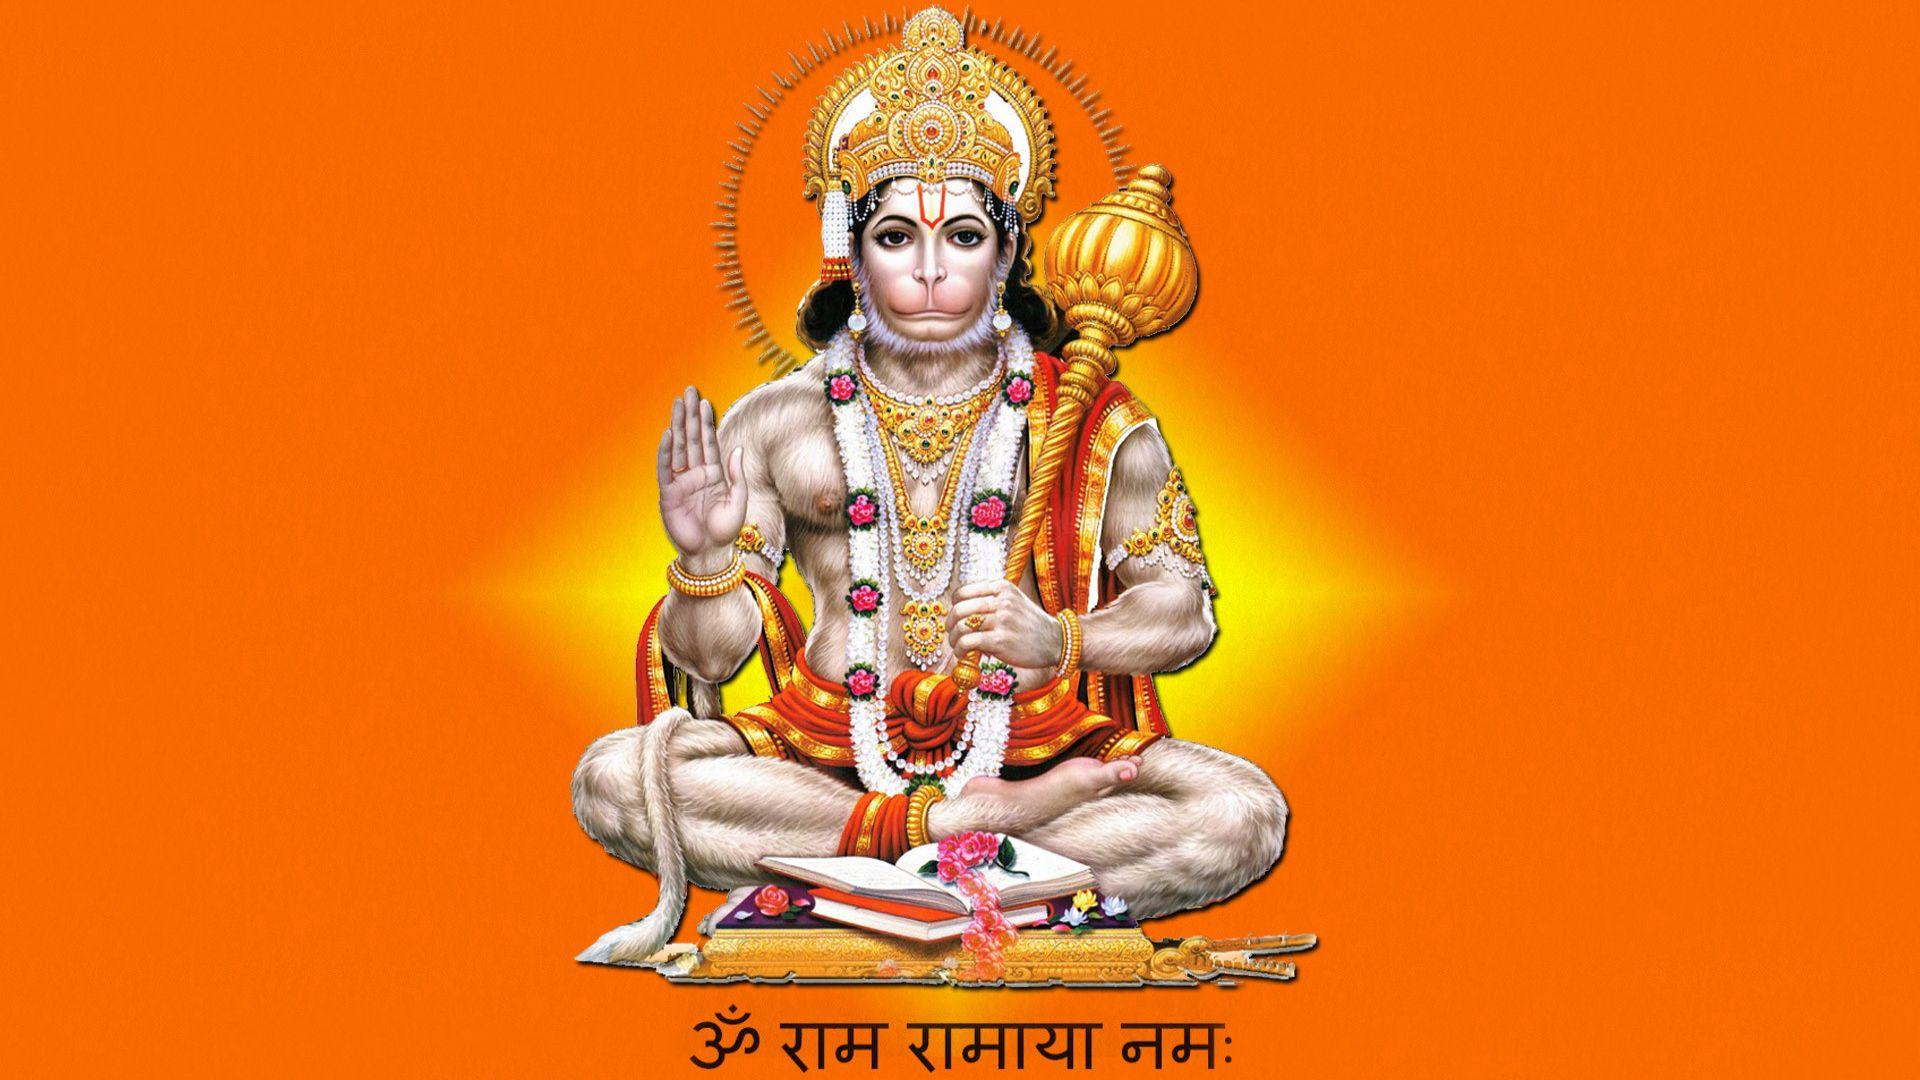 Lord Hanuman Wallpaper For Mobile